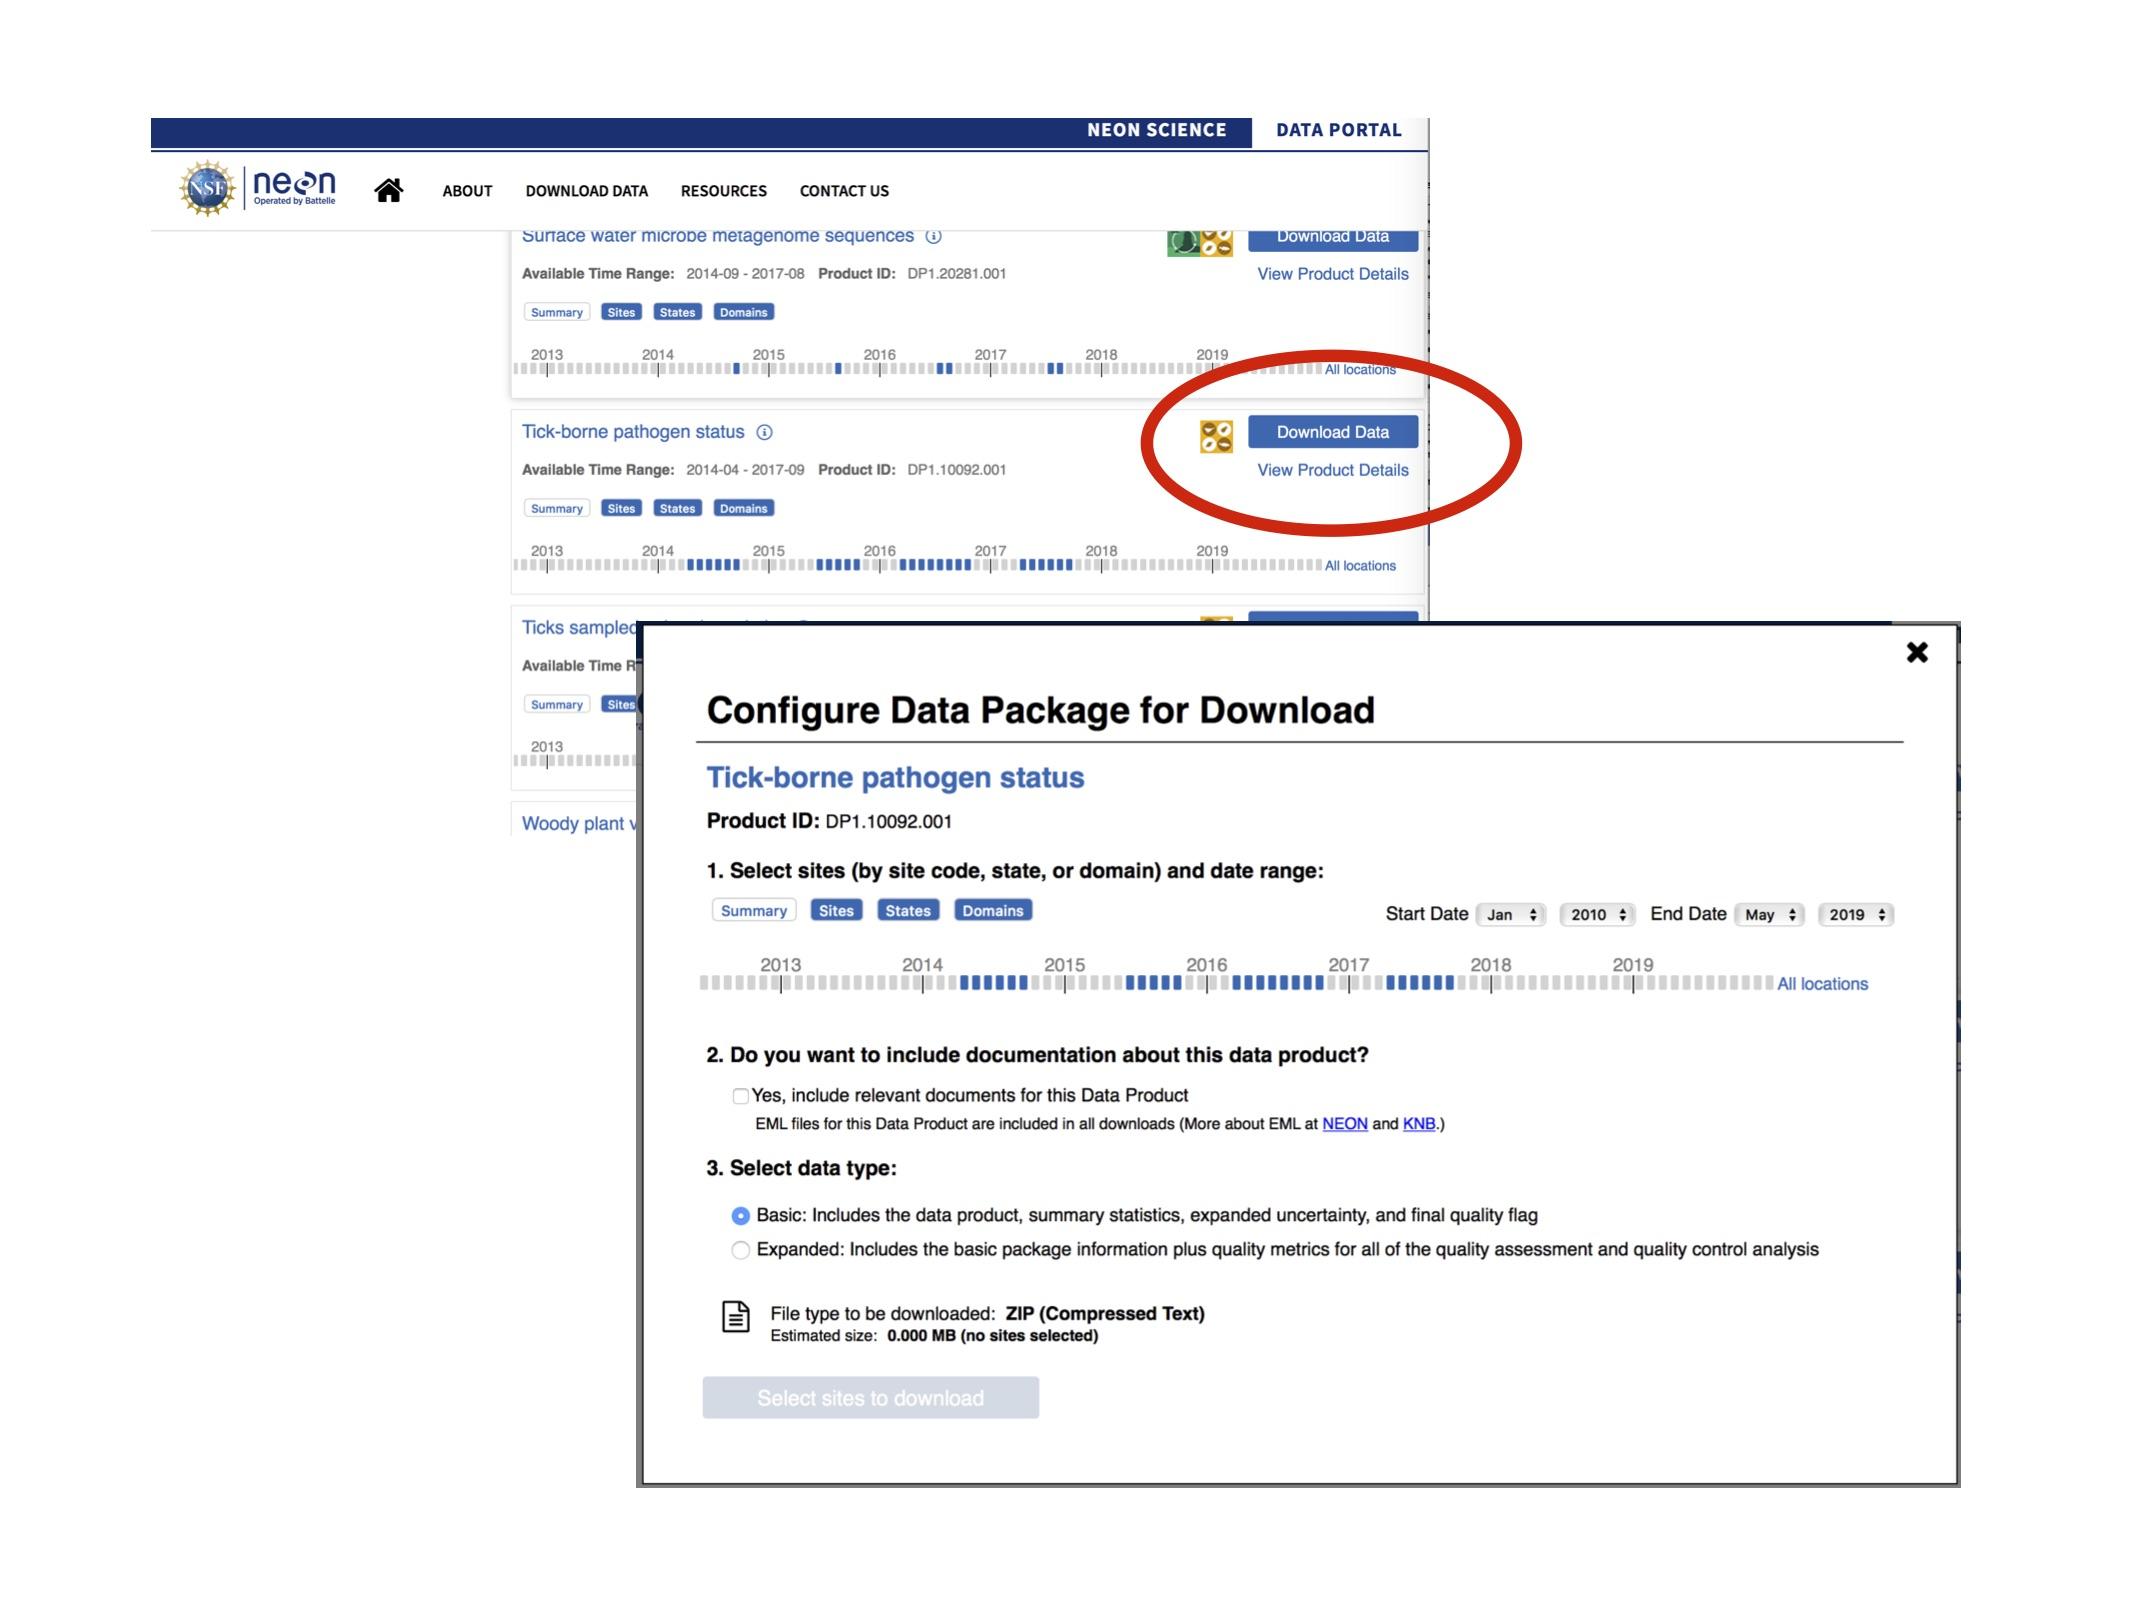 Figure 1. NEON data portal and download.